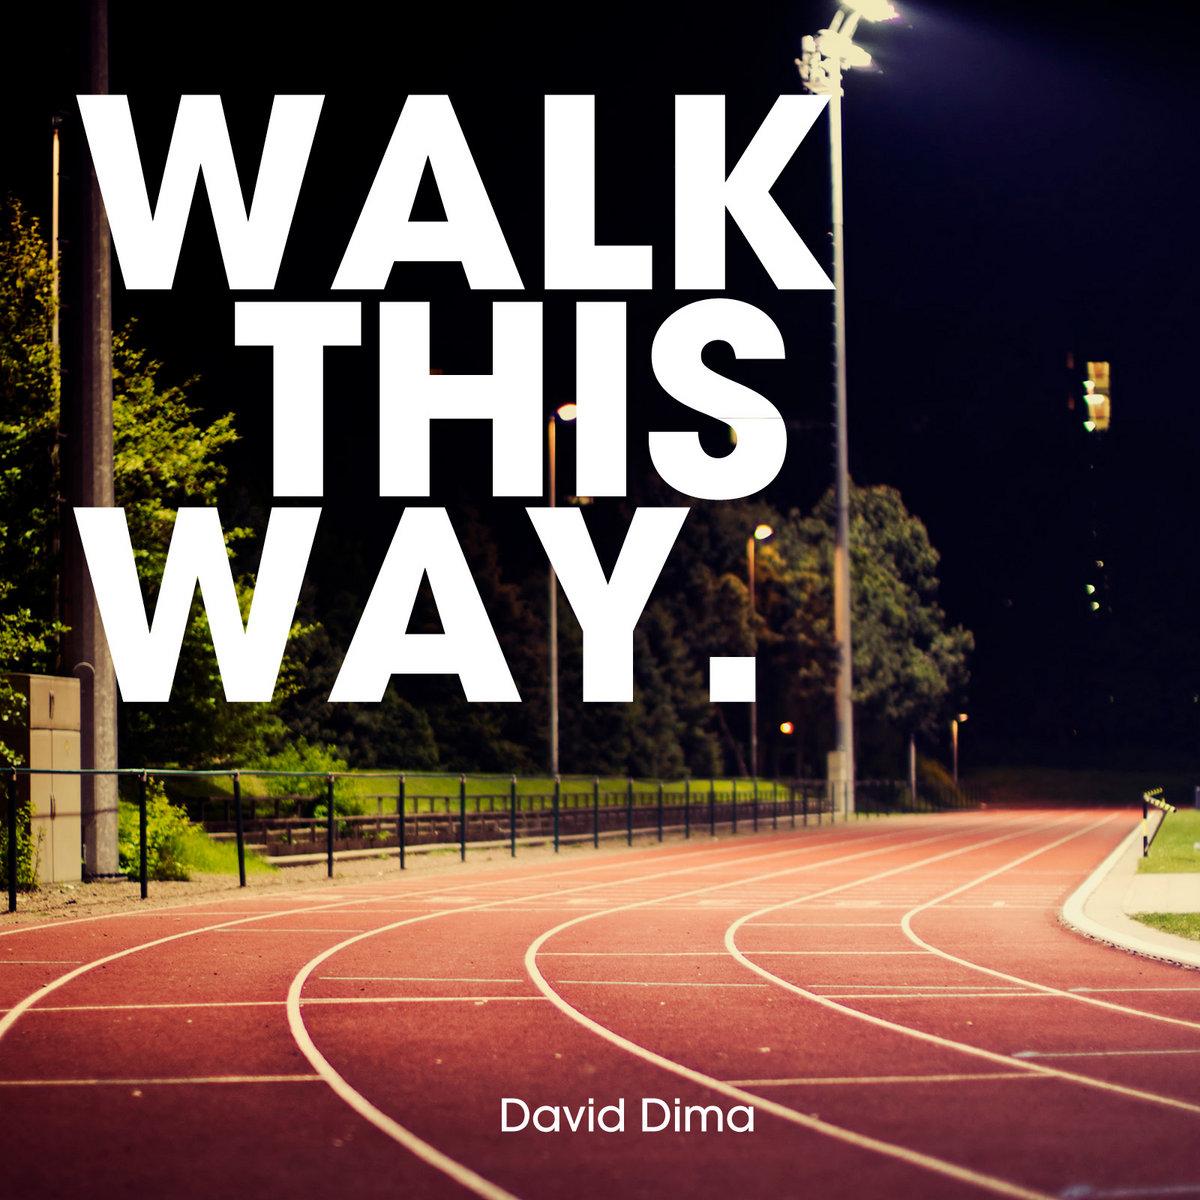 Walk This Way | Dima Music: dimamusic.bandcamp.com/album/walk-this-way